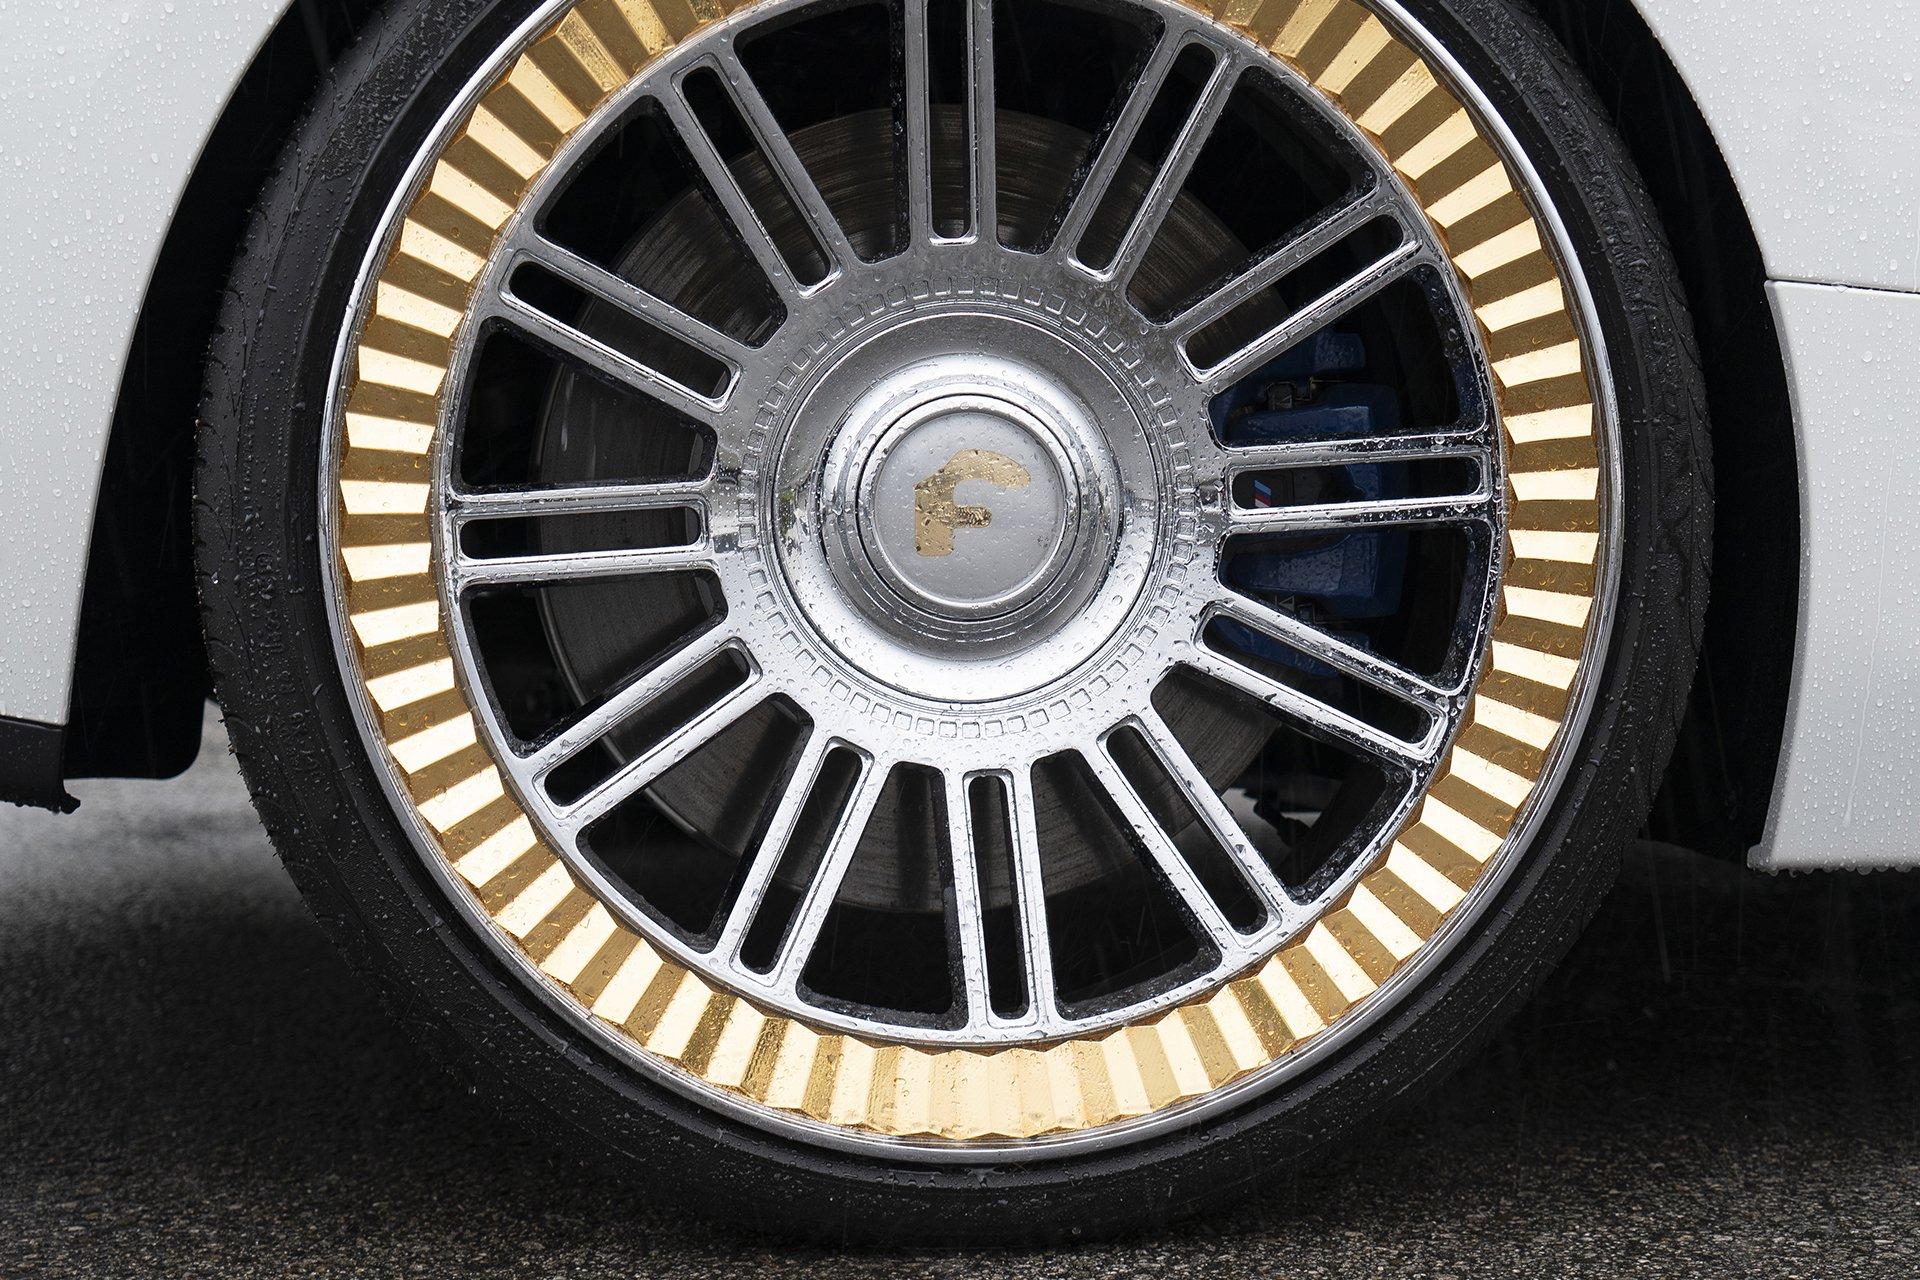 Forgiato Orologio-MBMW 8-Series Cabriolet (6)